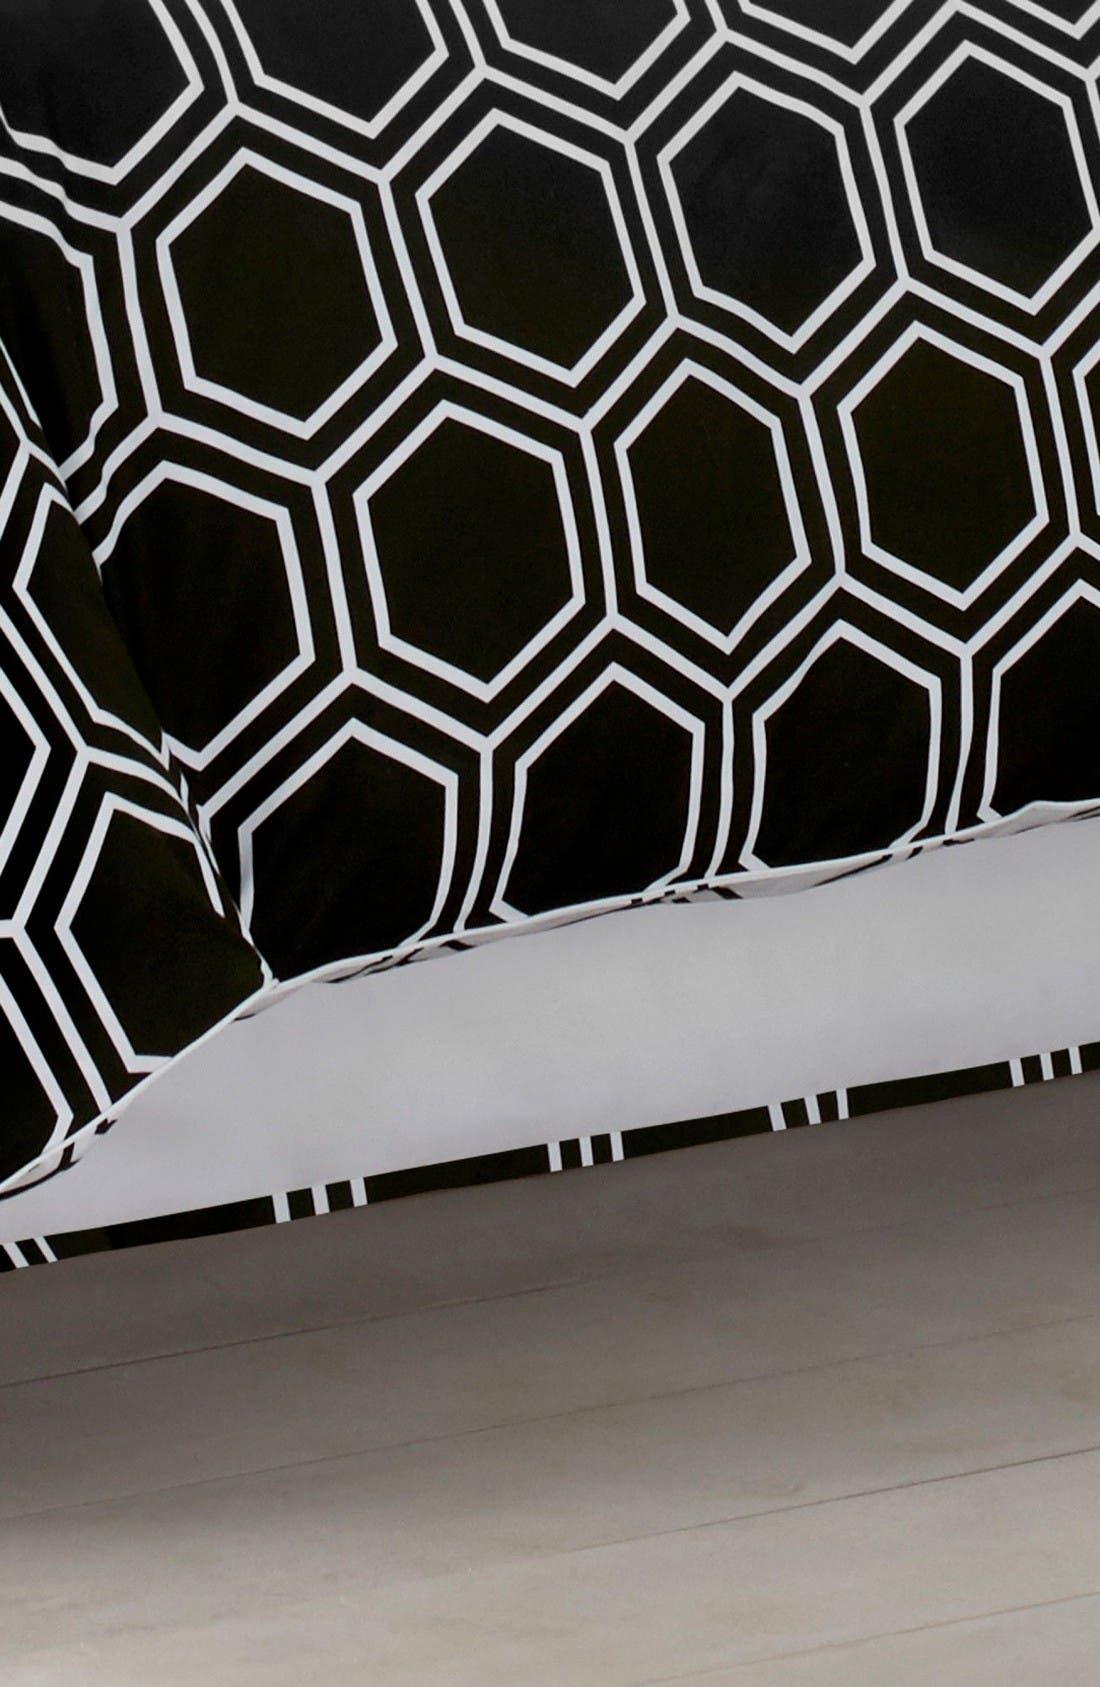 Main Image - Jill Rosenwald Blackpoint Hex Bed Skirt